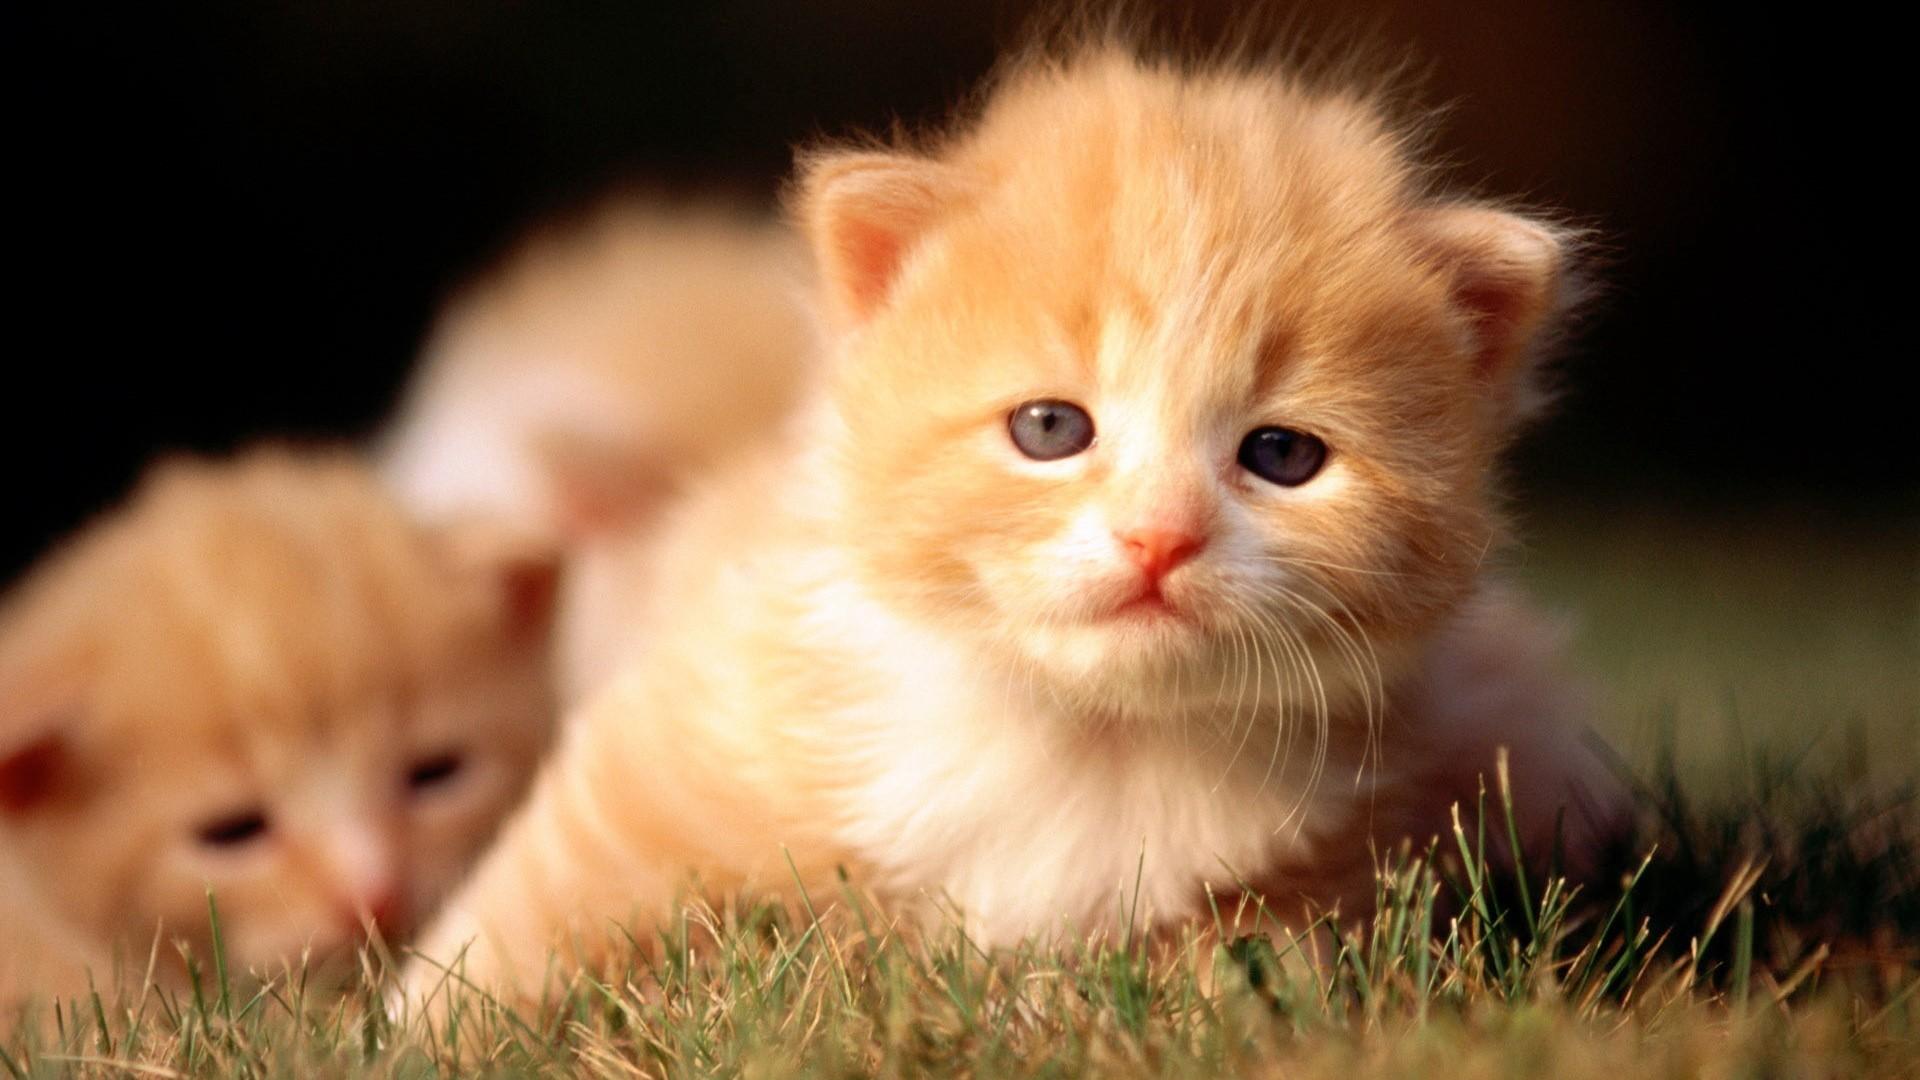 Res: 1920x1080, Cats Kittens Wallpaper  Cats Kittens